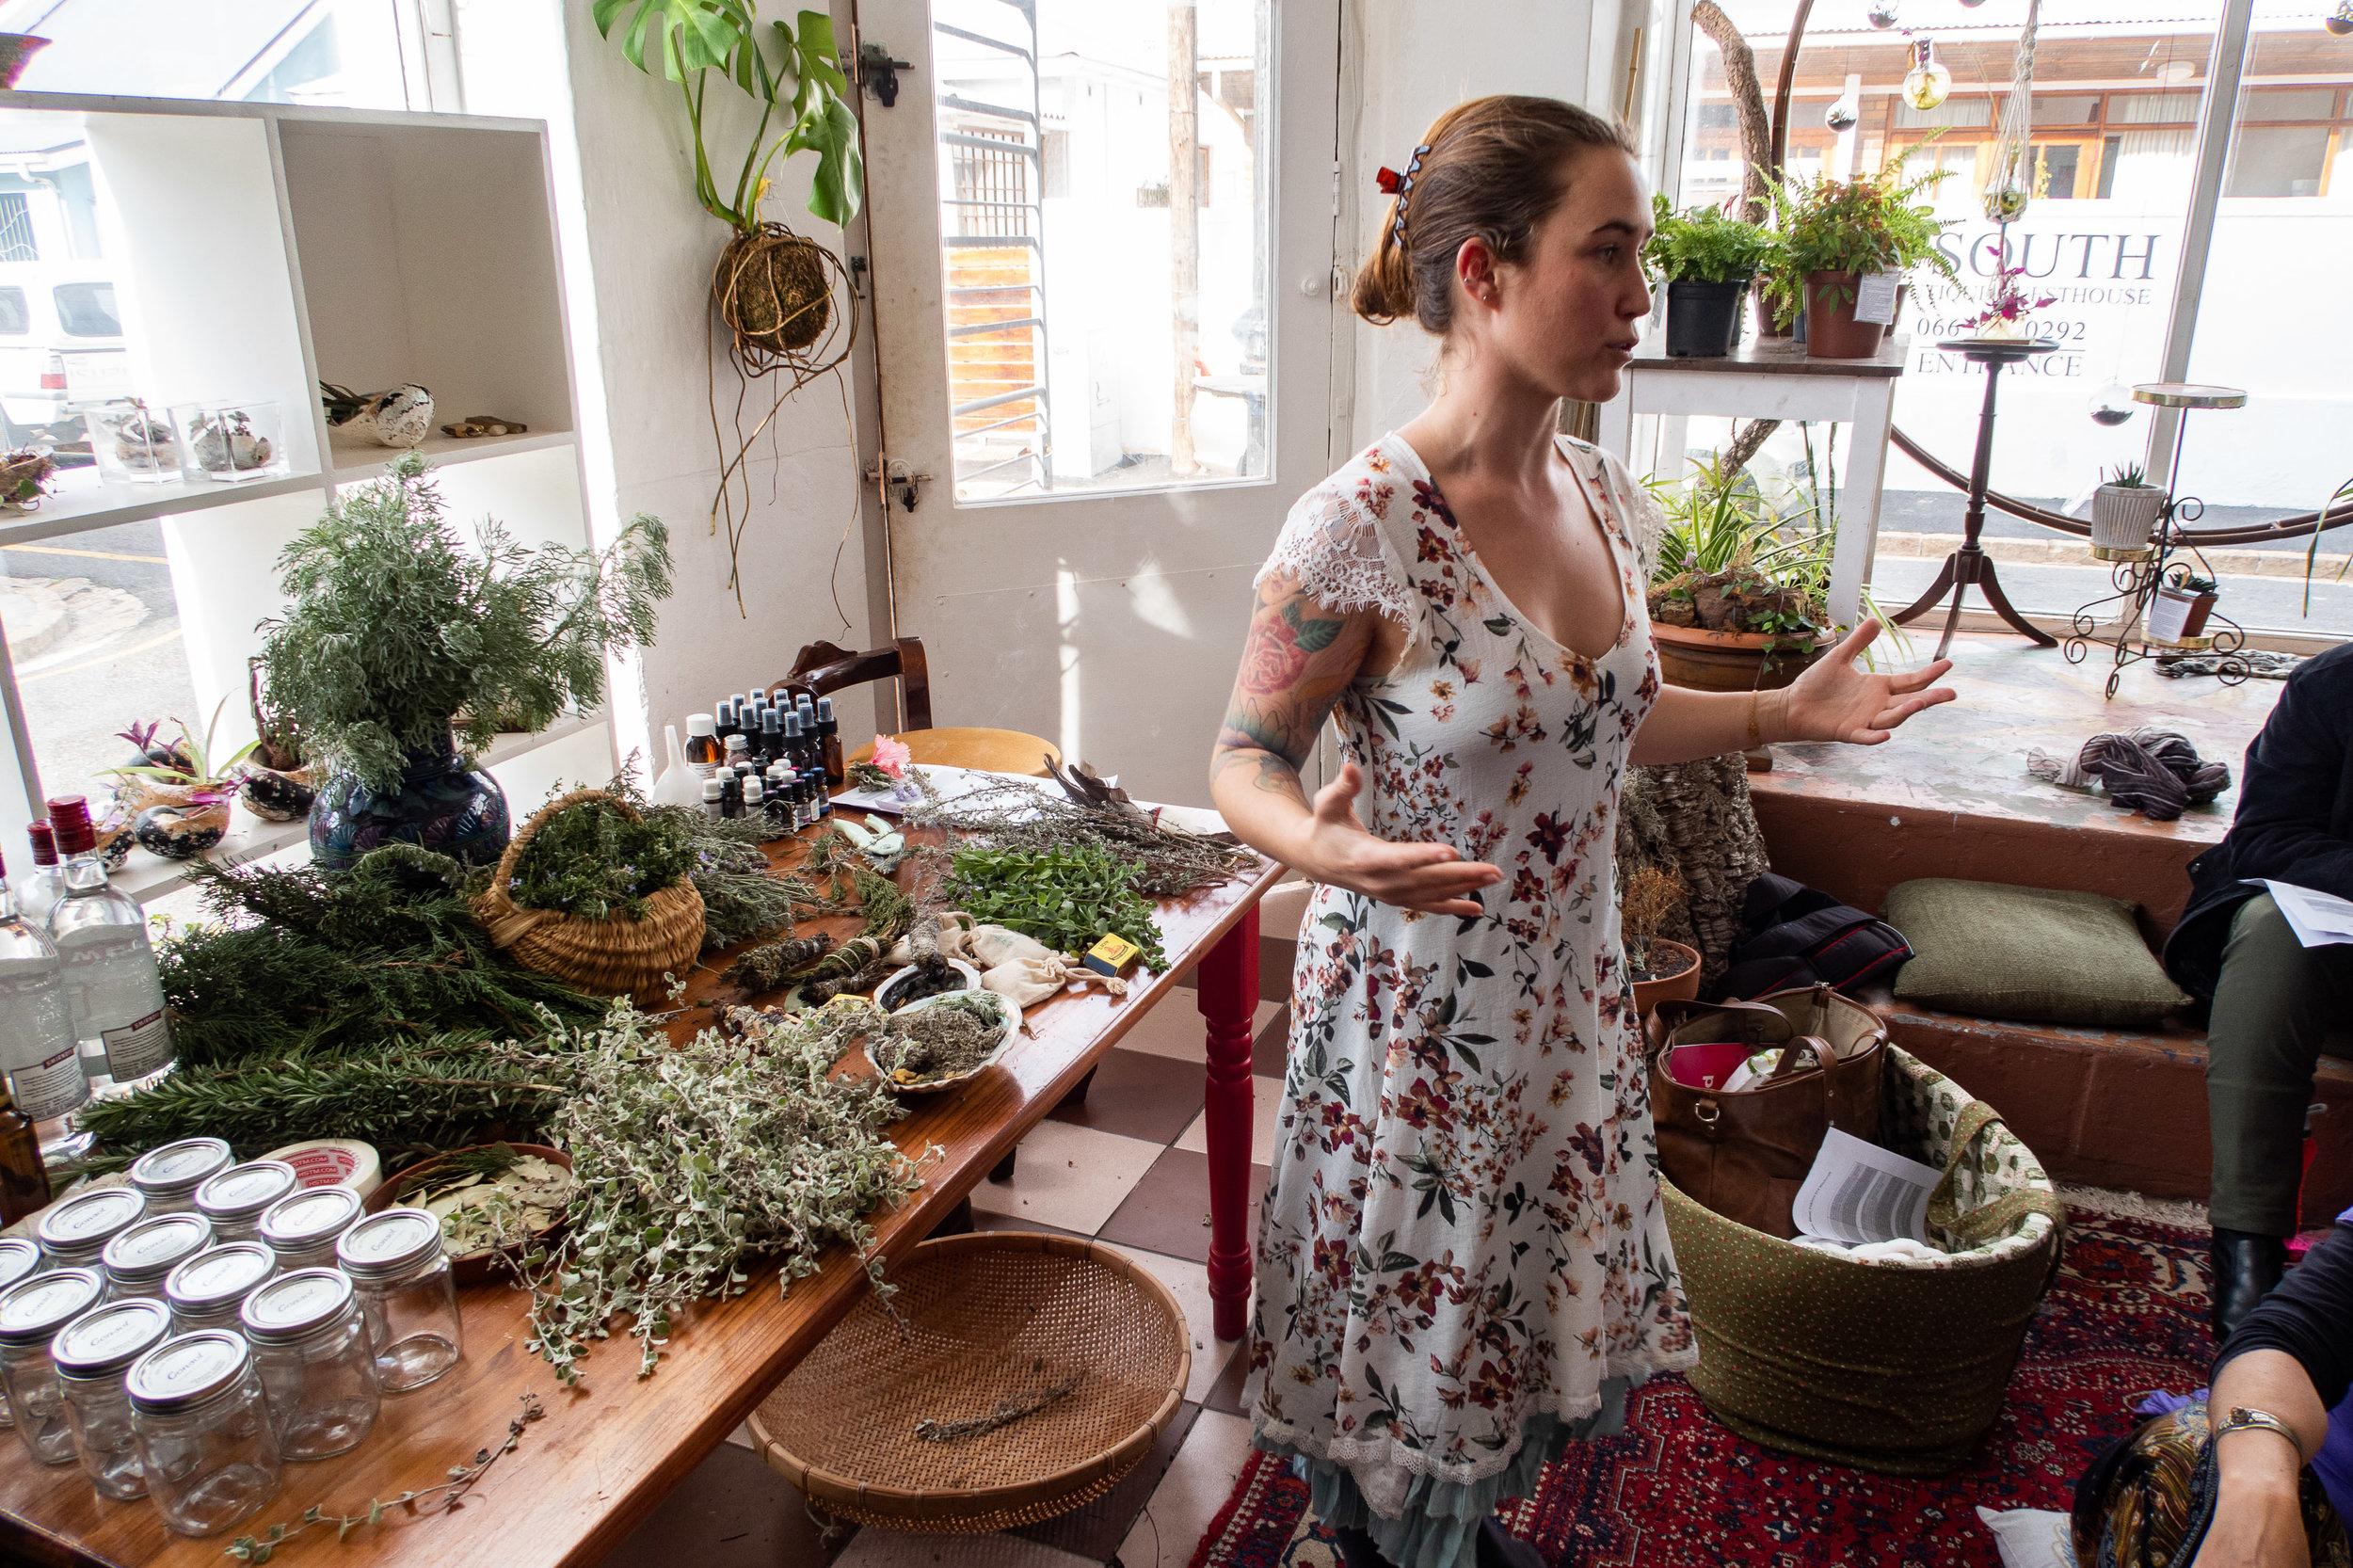 wild-love-herbalism-workshop-women-cape-town-south-africa-rewilding-019.jpg